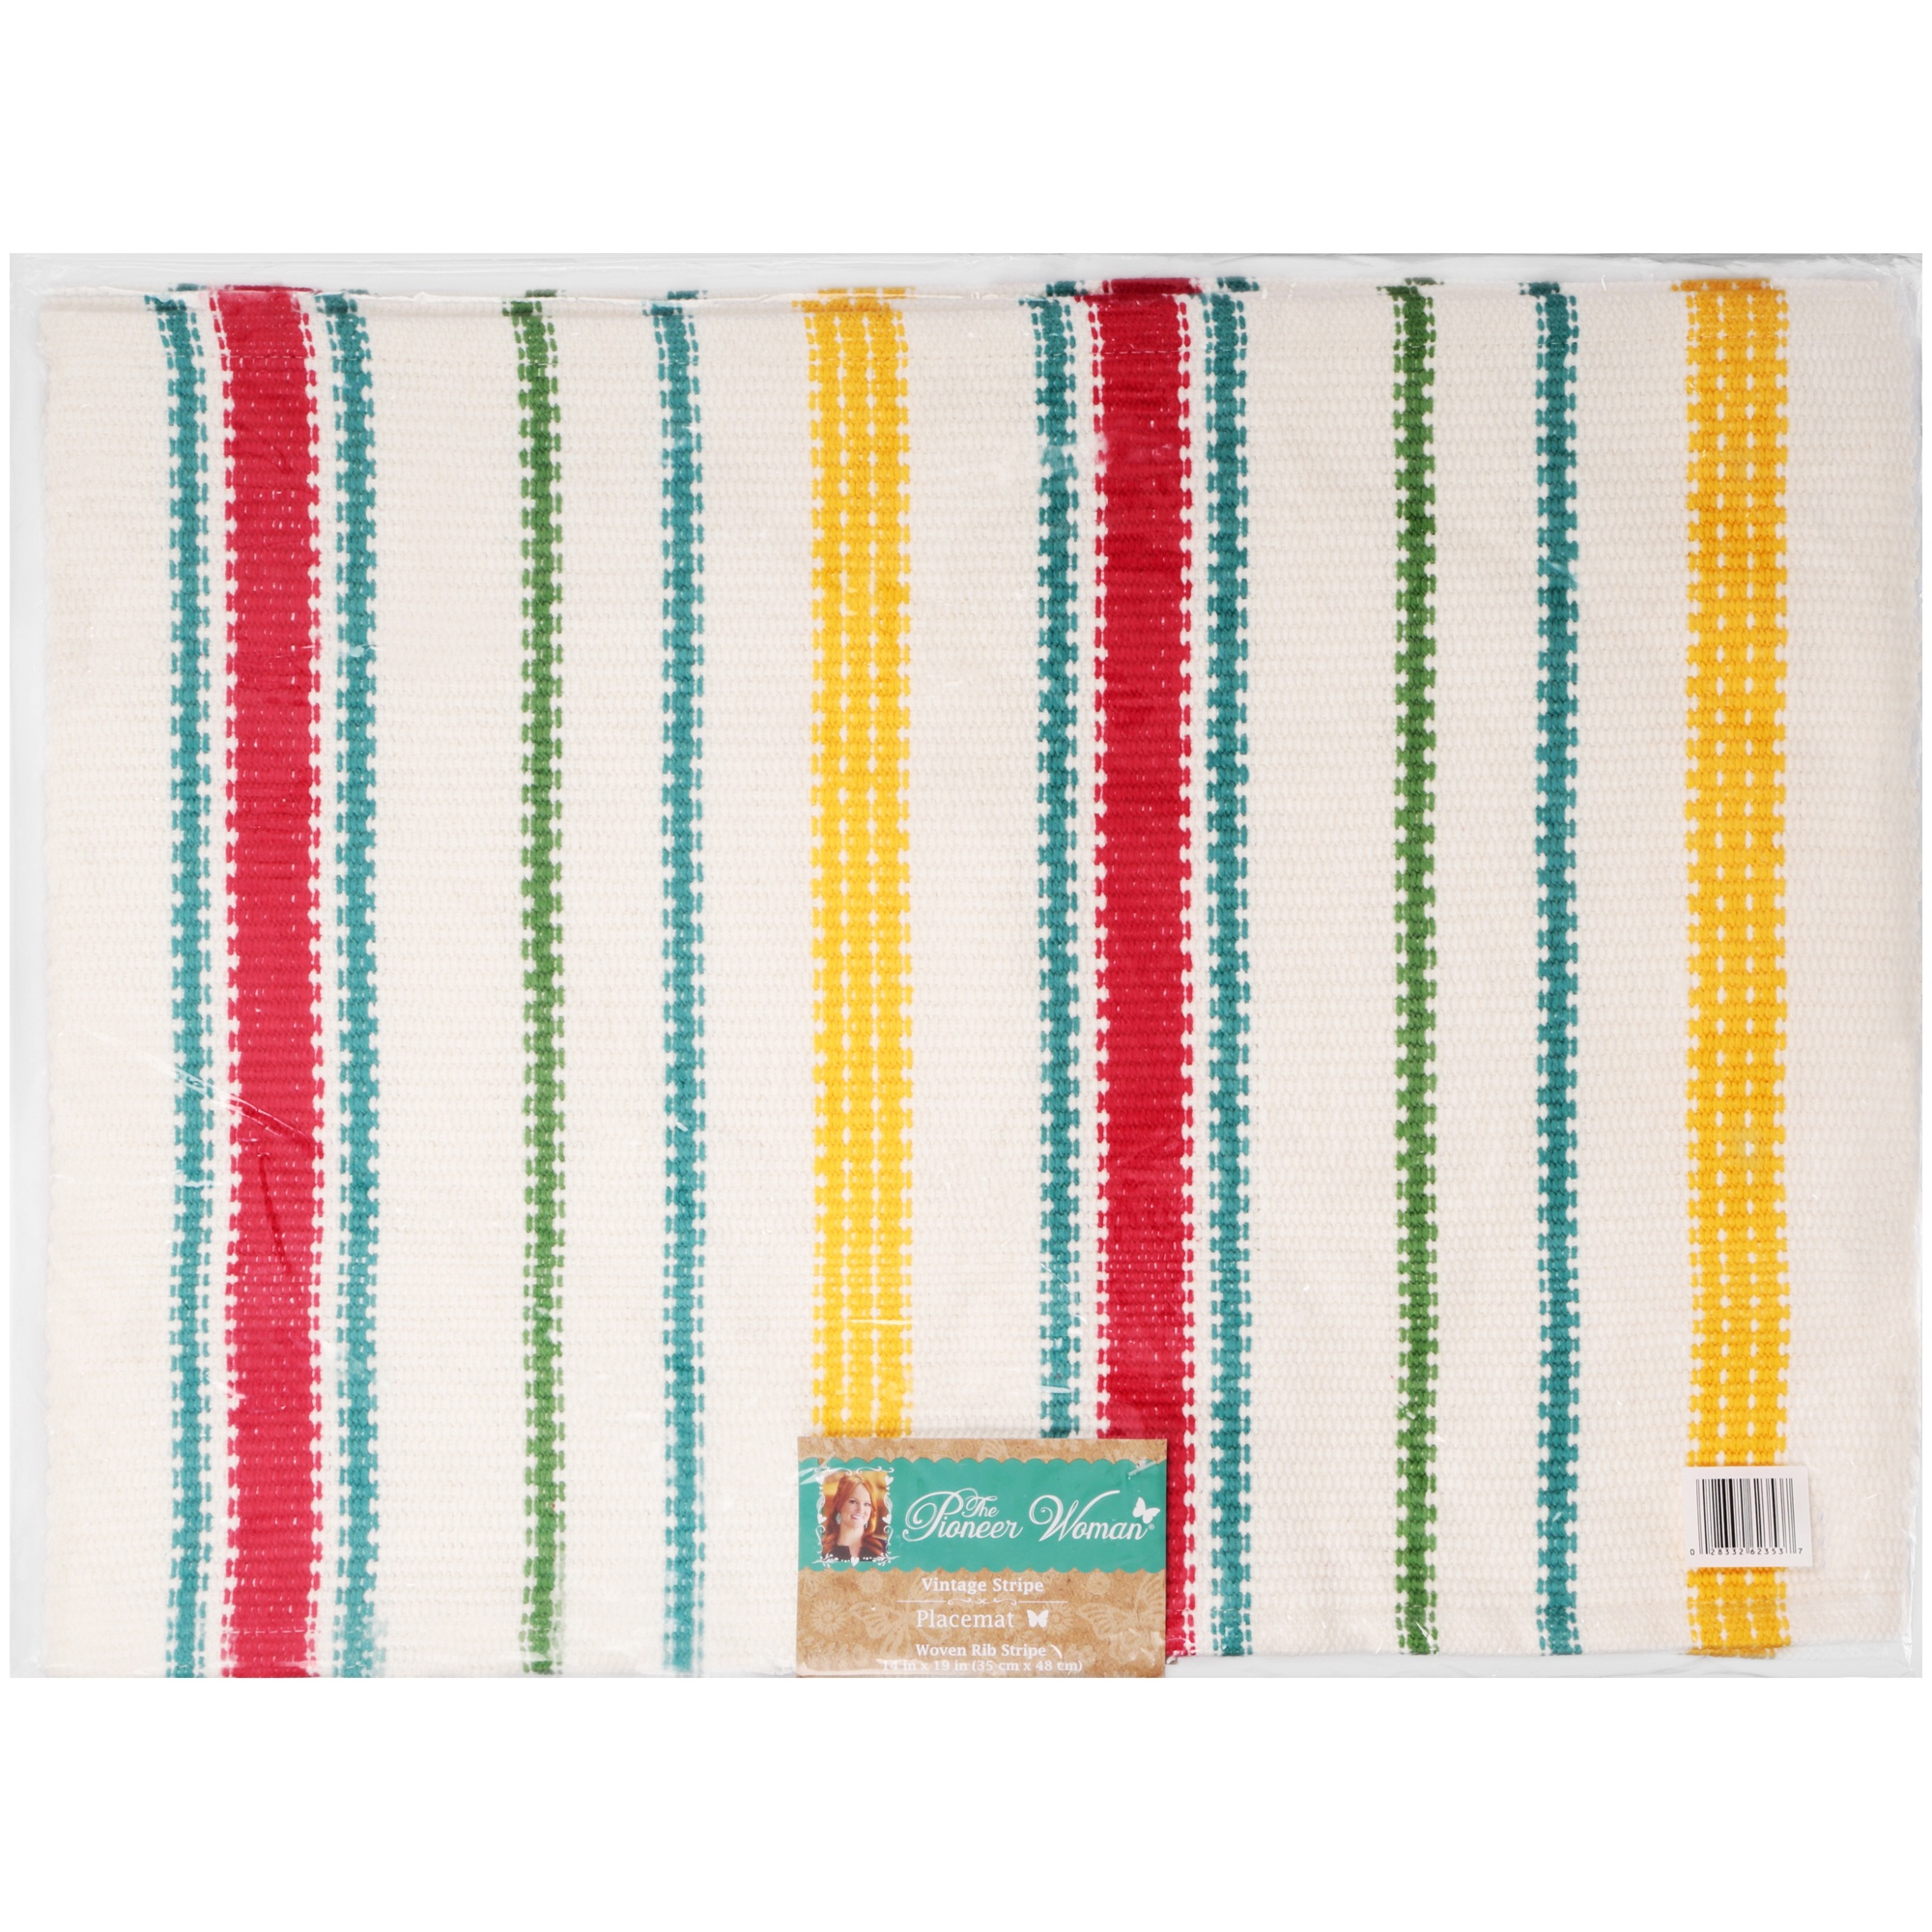 New The Pioneer Woman Denim Set Of Four Cloth Napkins Versatile Size 18 X 18 Kitchen Dining Linens Textiles Napkins